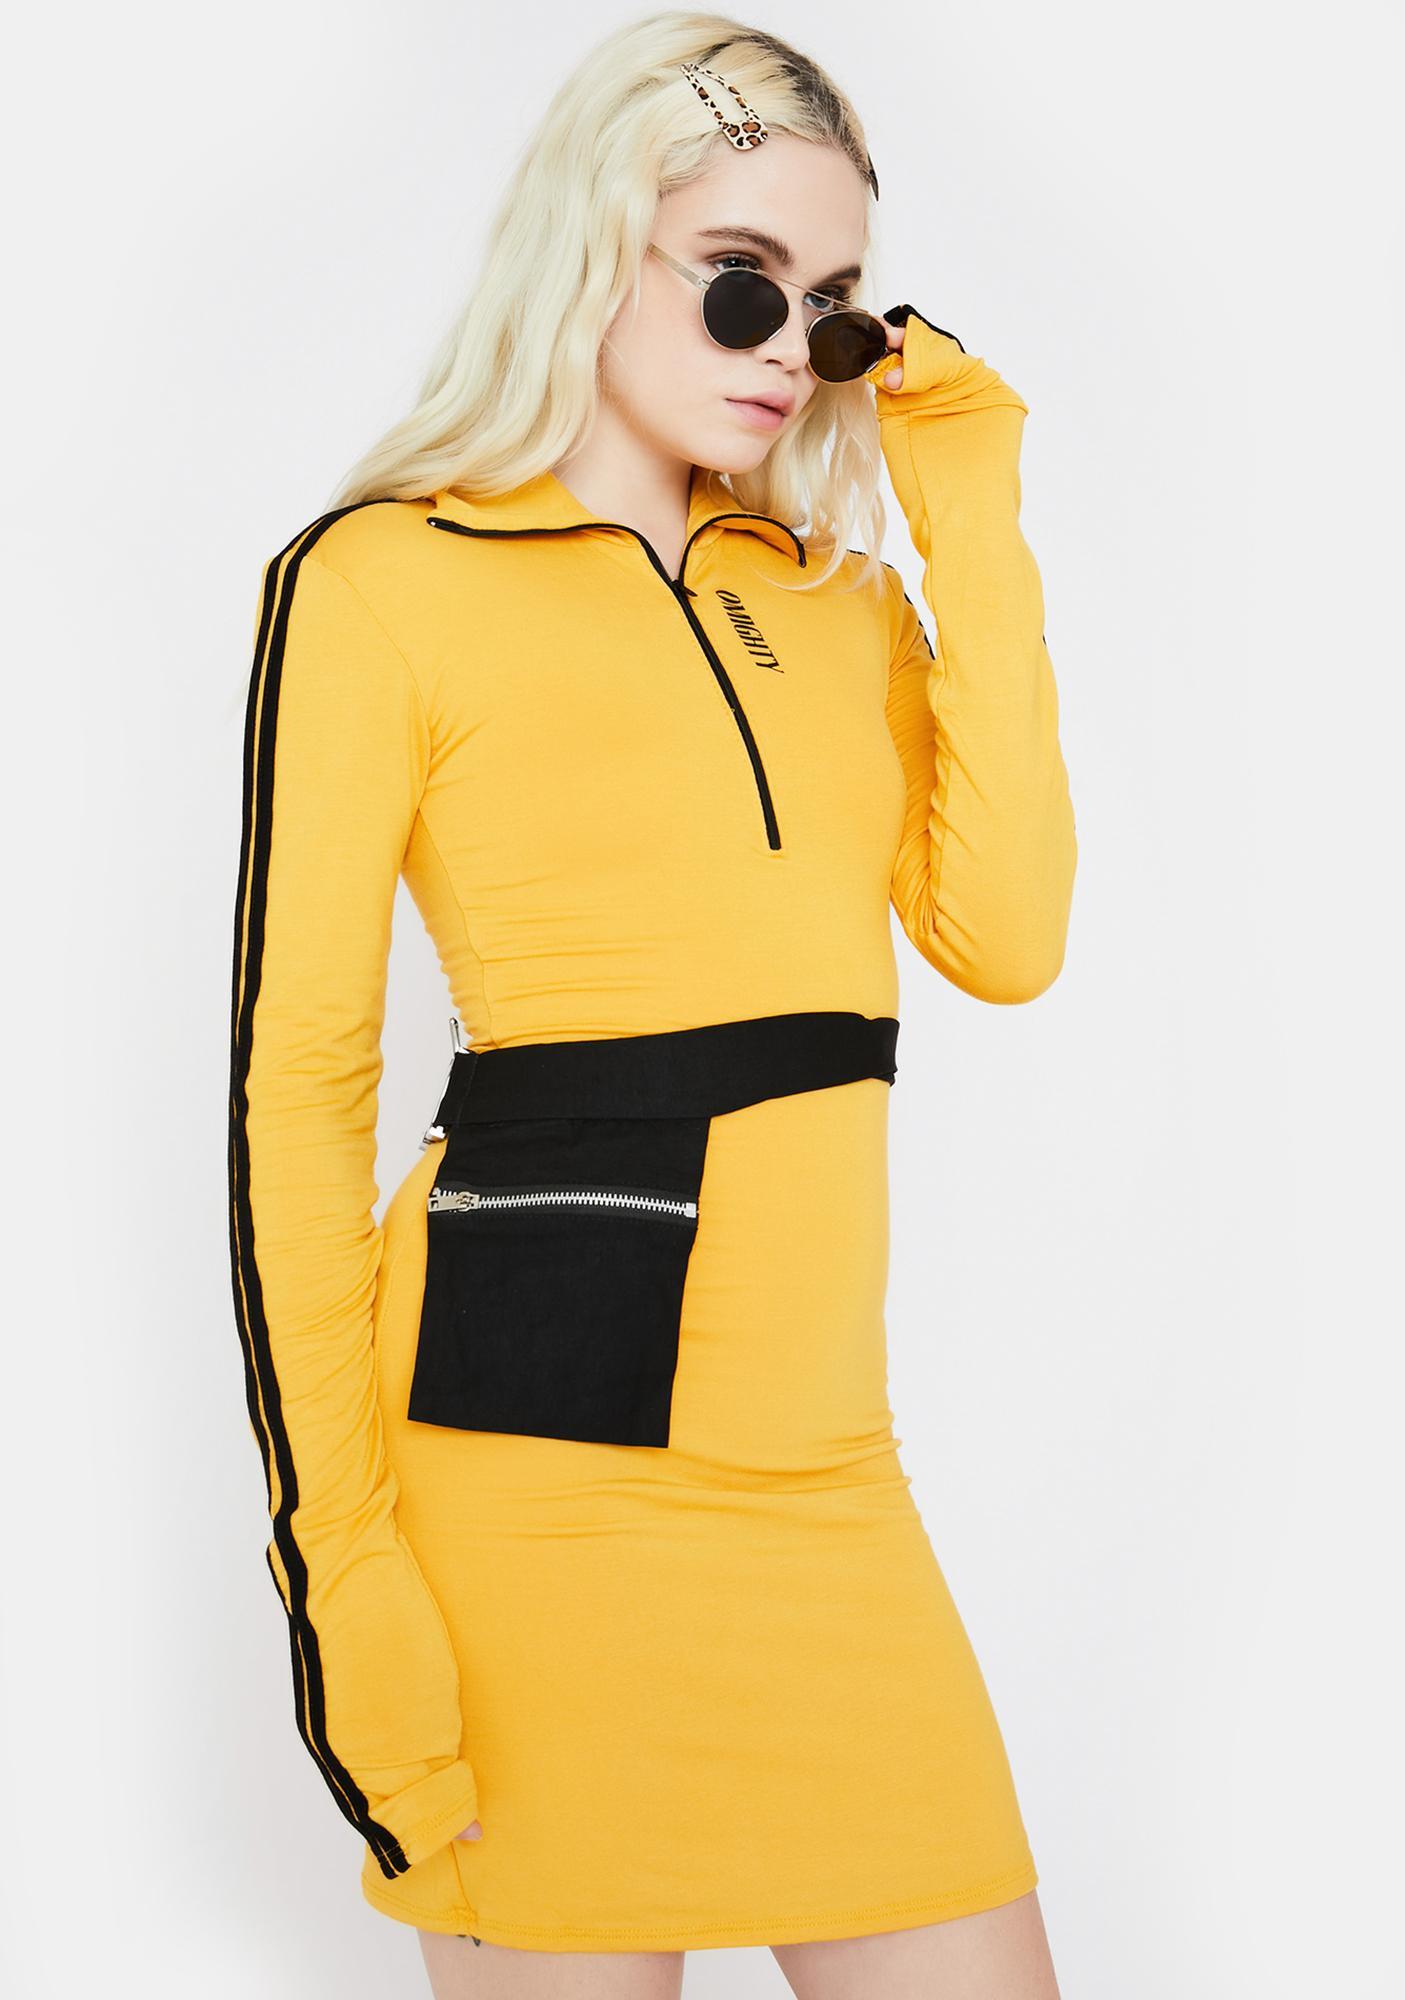 O Mighty Player 3 Mini Dress